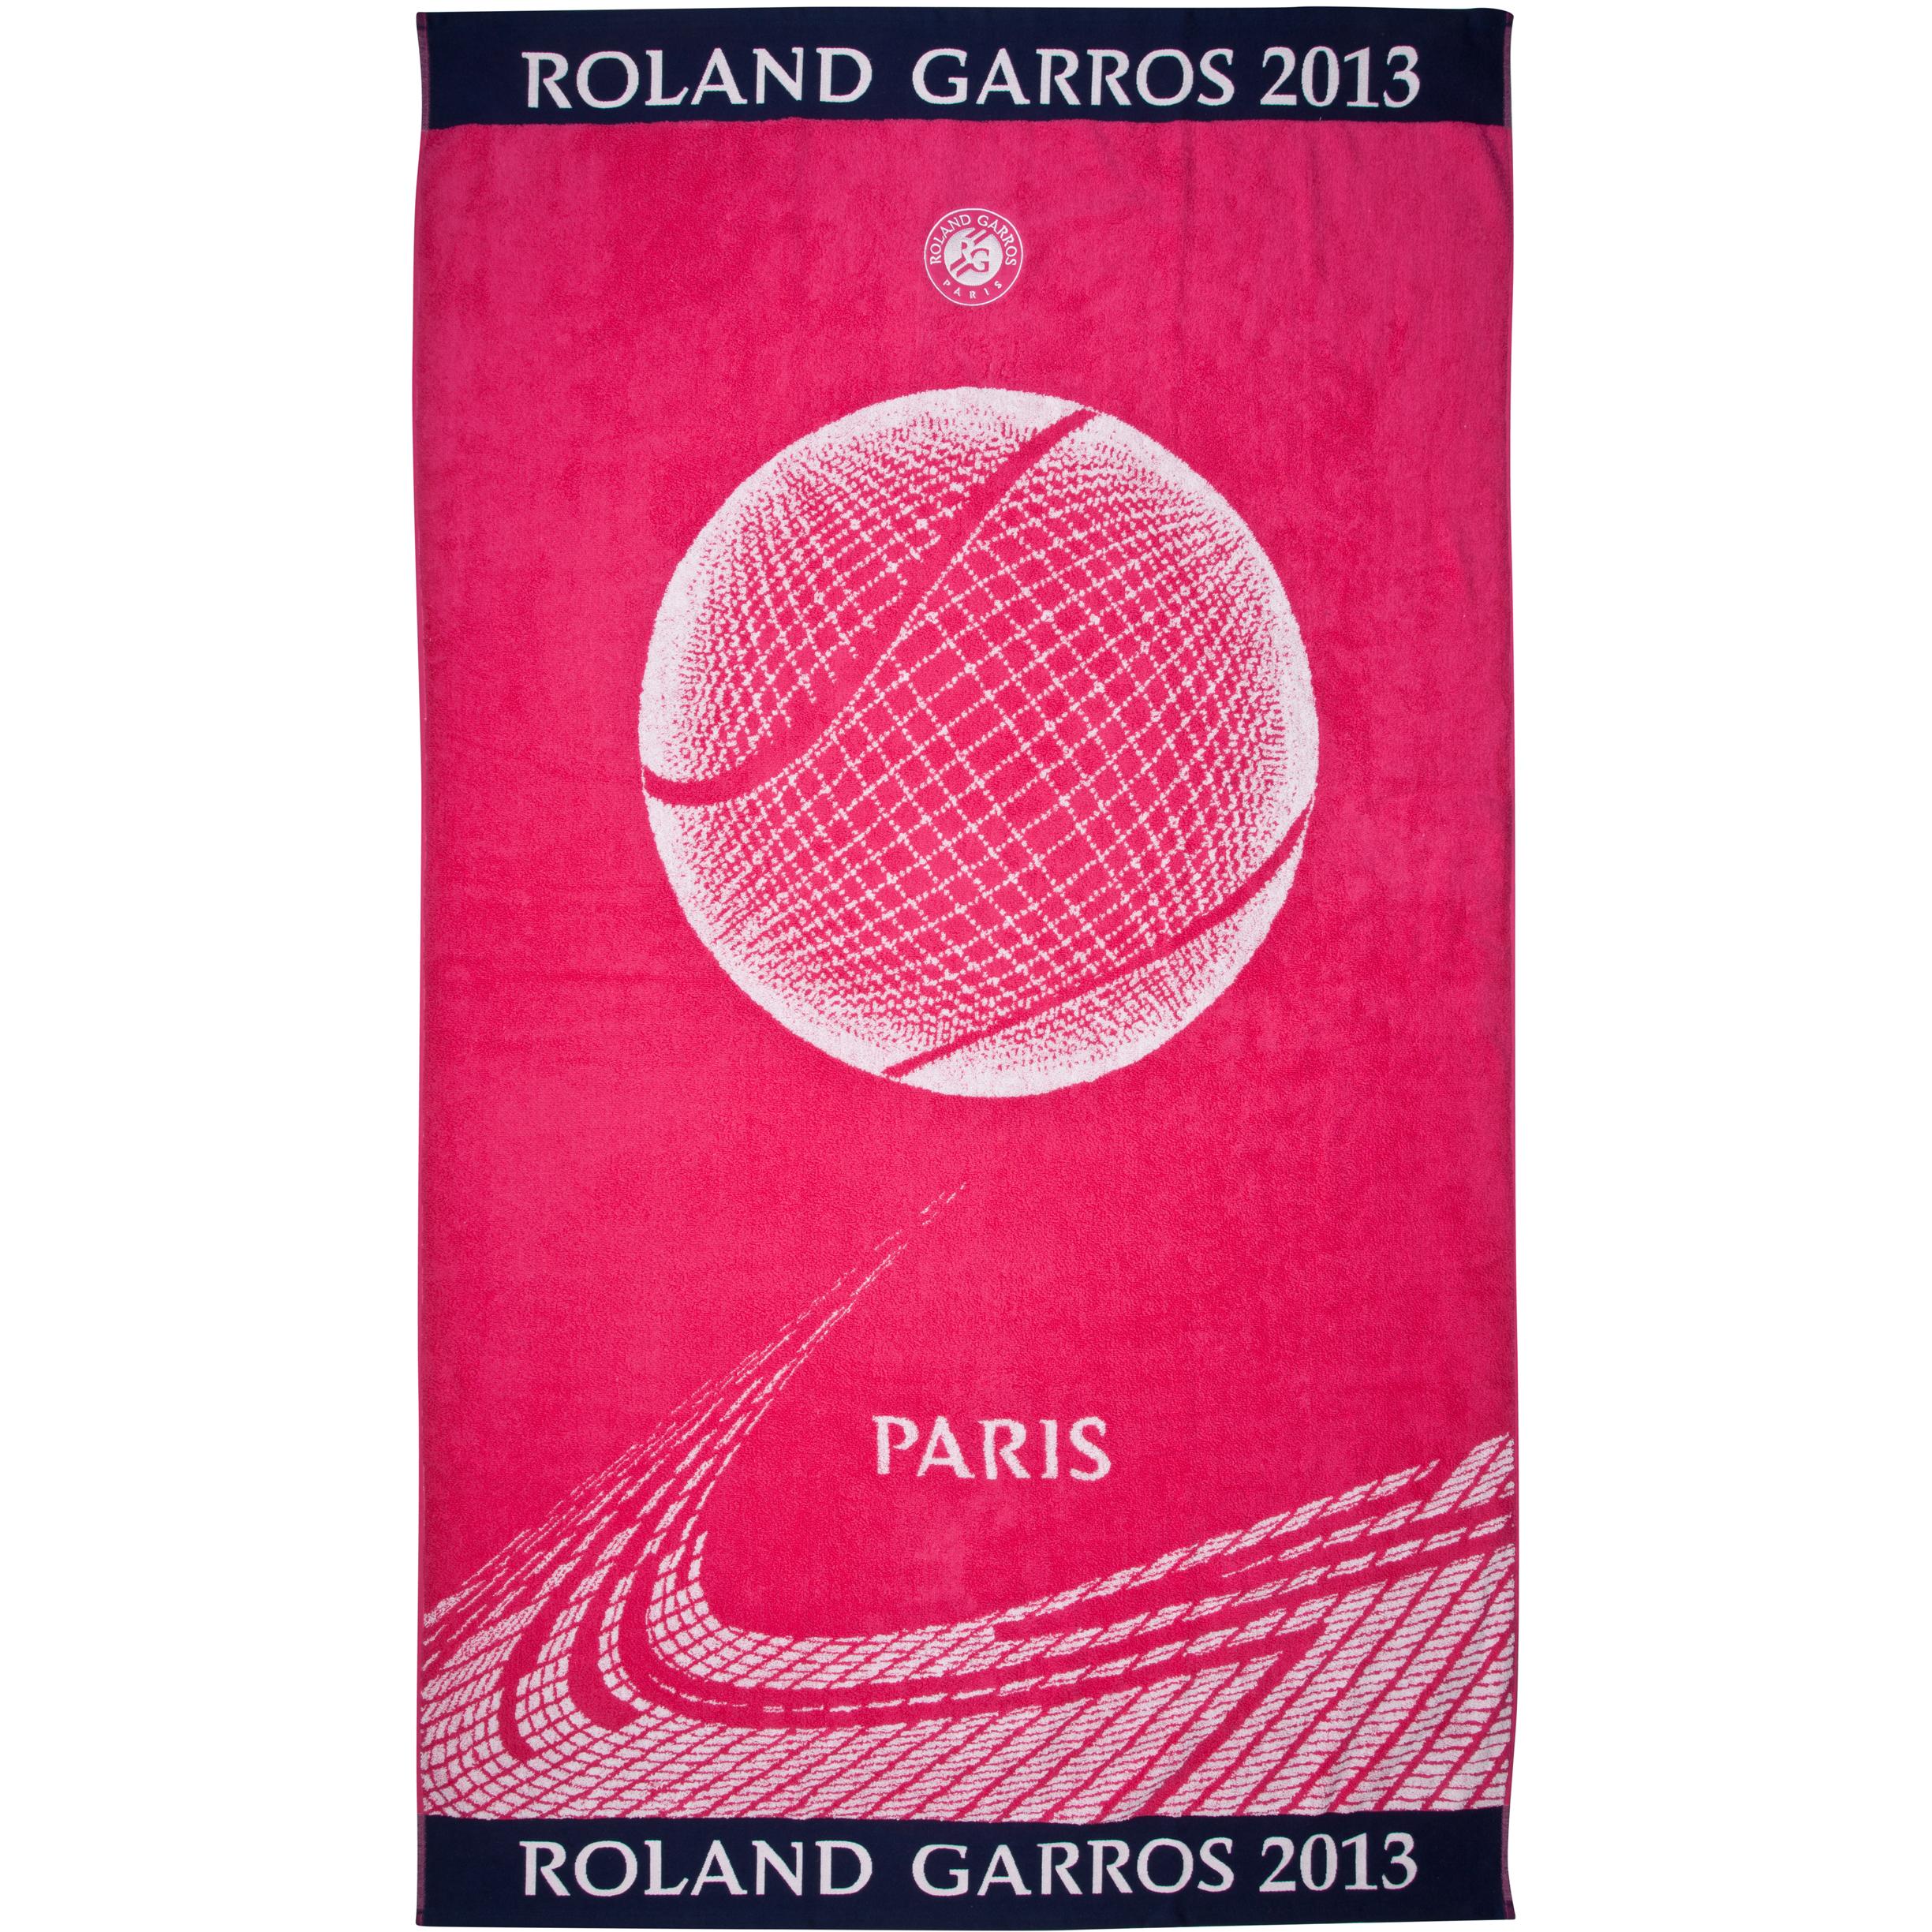 Roland-Garros Women's Large Championship Towel 2013